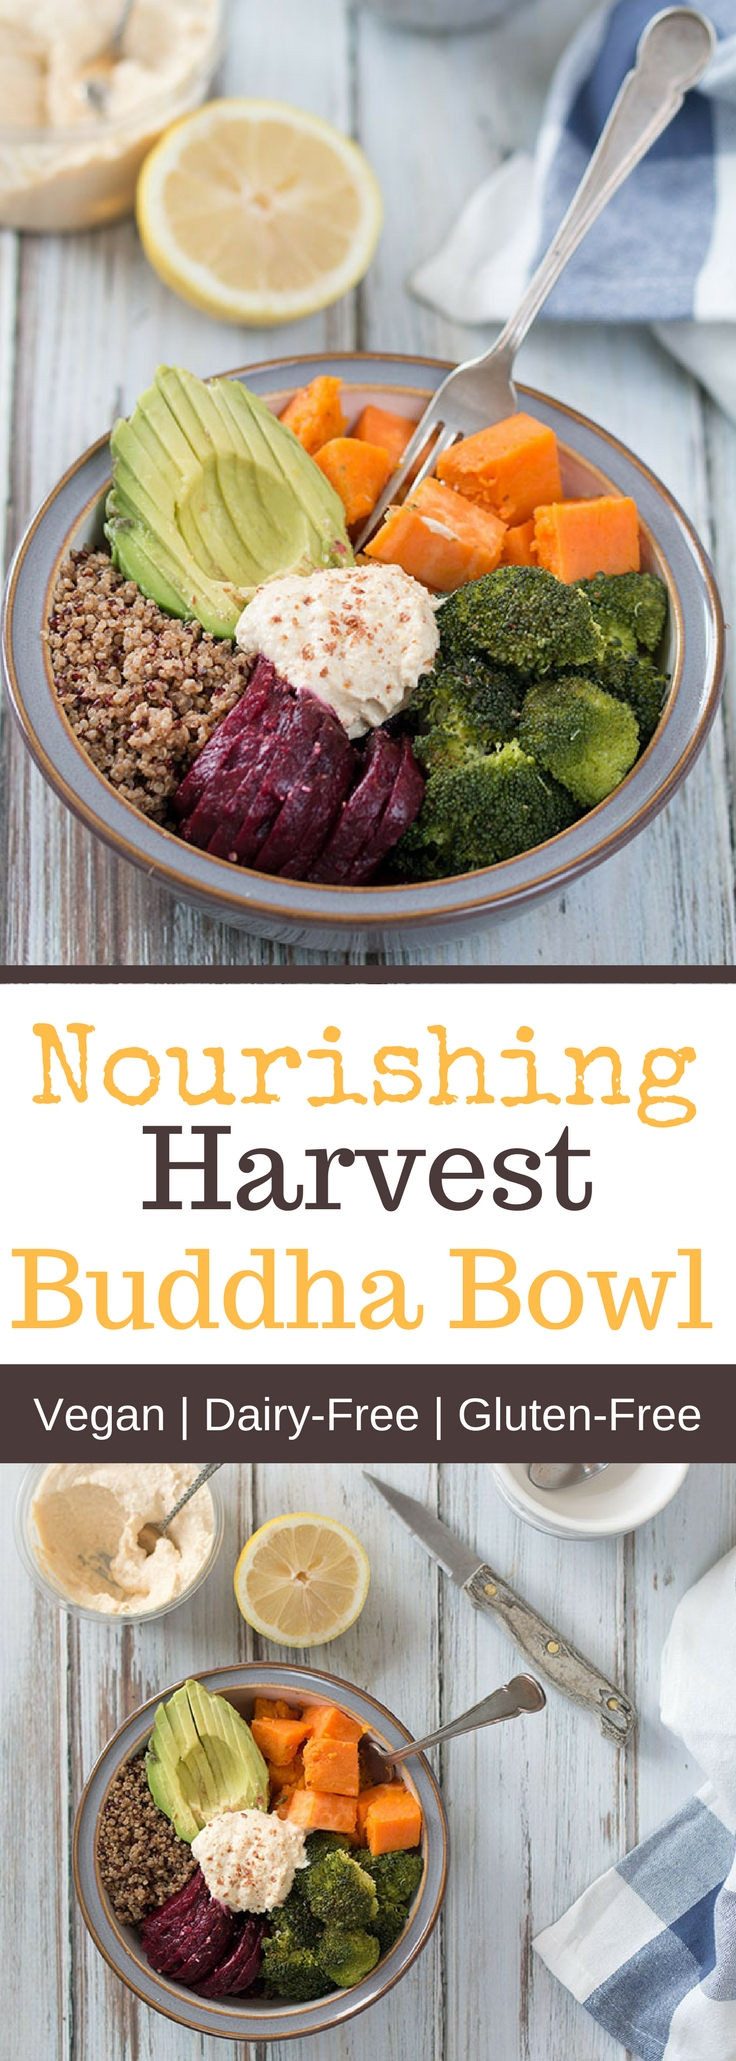 Nourishing Harvest Buddha Bowl